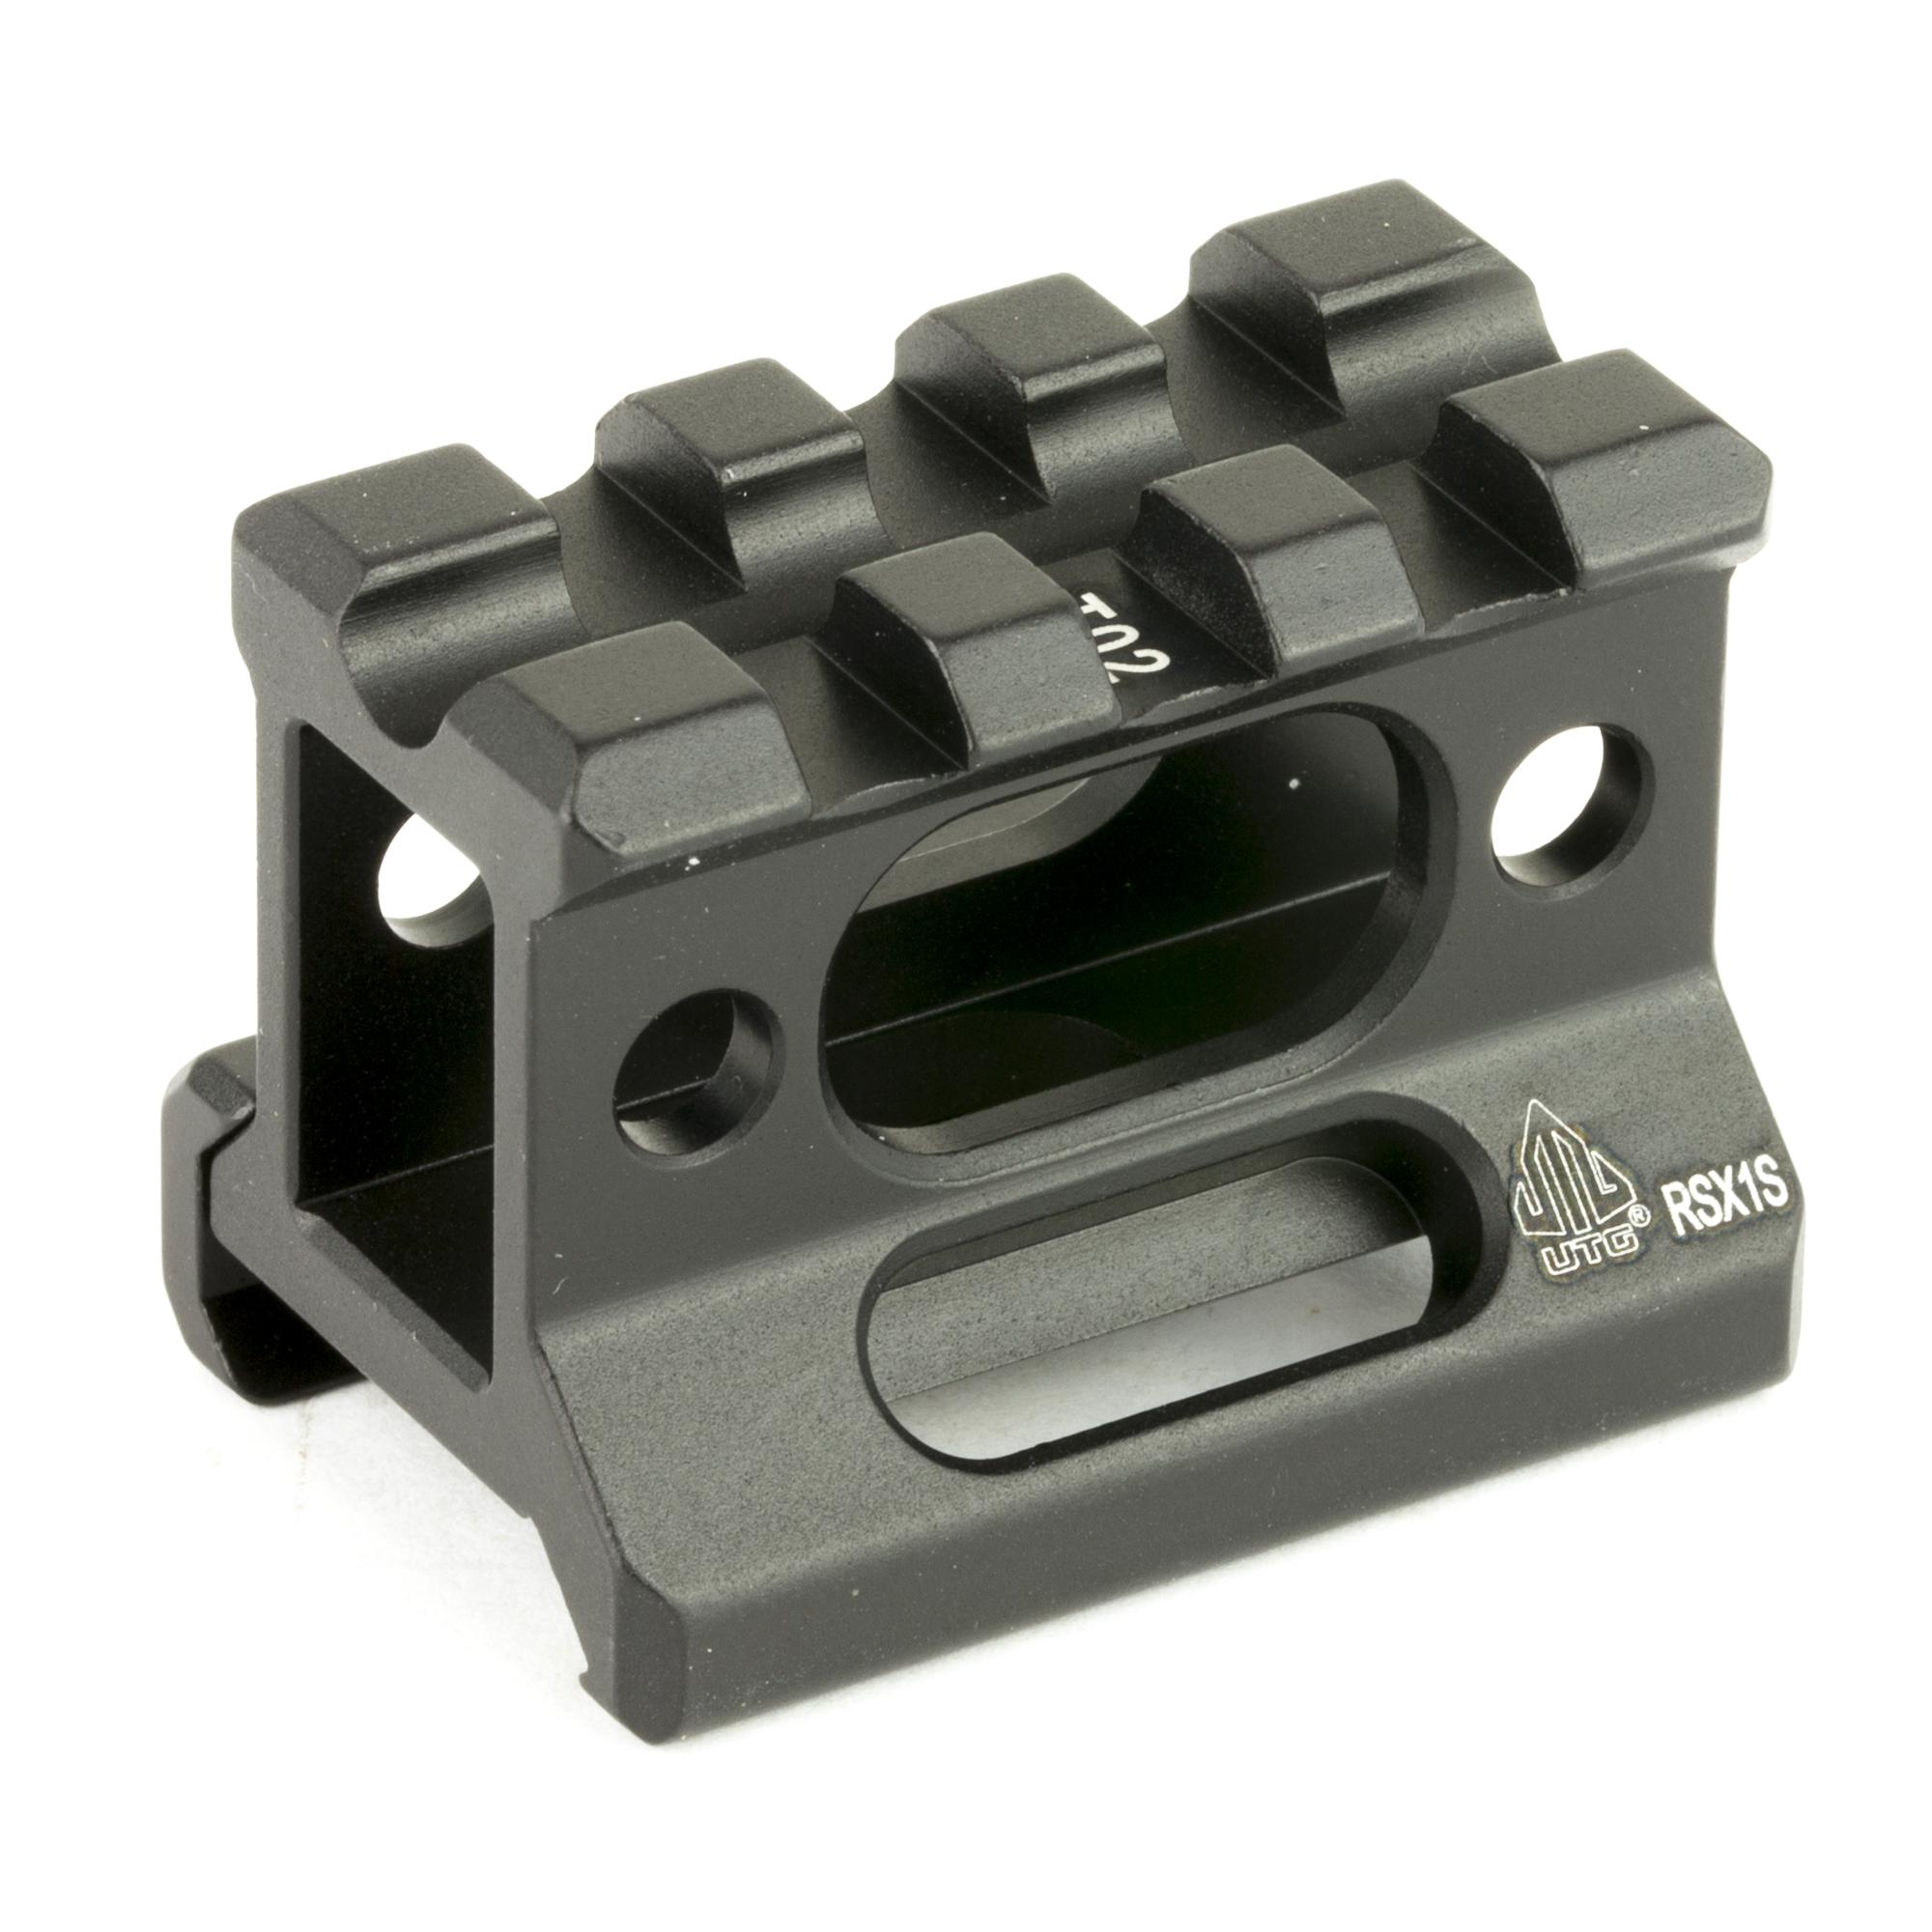 Leapers UTG Super Slim Picatinny Riser Mount - MSR Arms 4